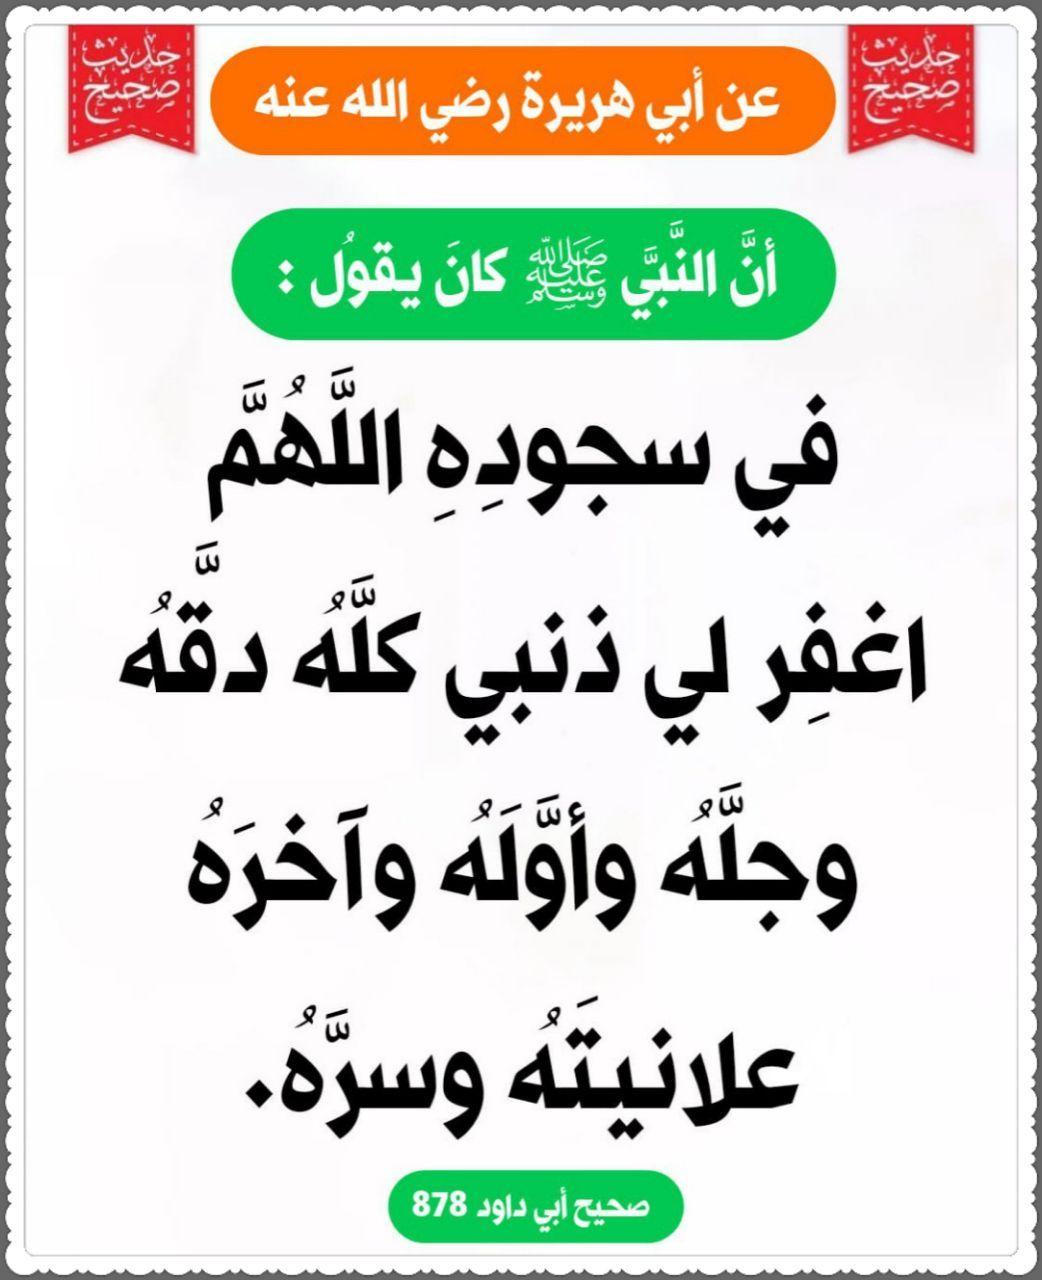 Pin By Zubir On أقوال الصحابة والعلماء Ahadith Hadith Al Hadith